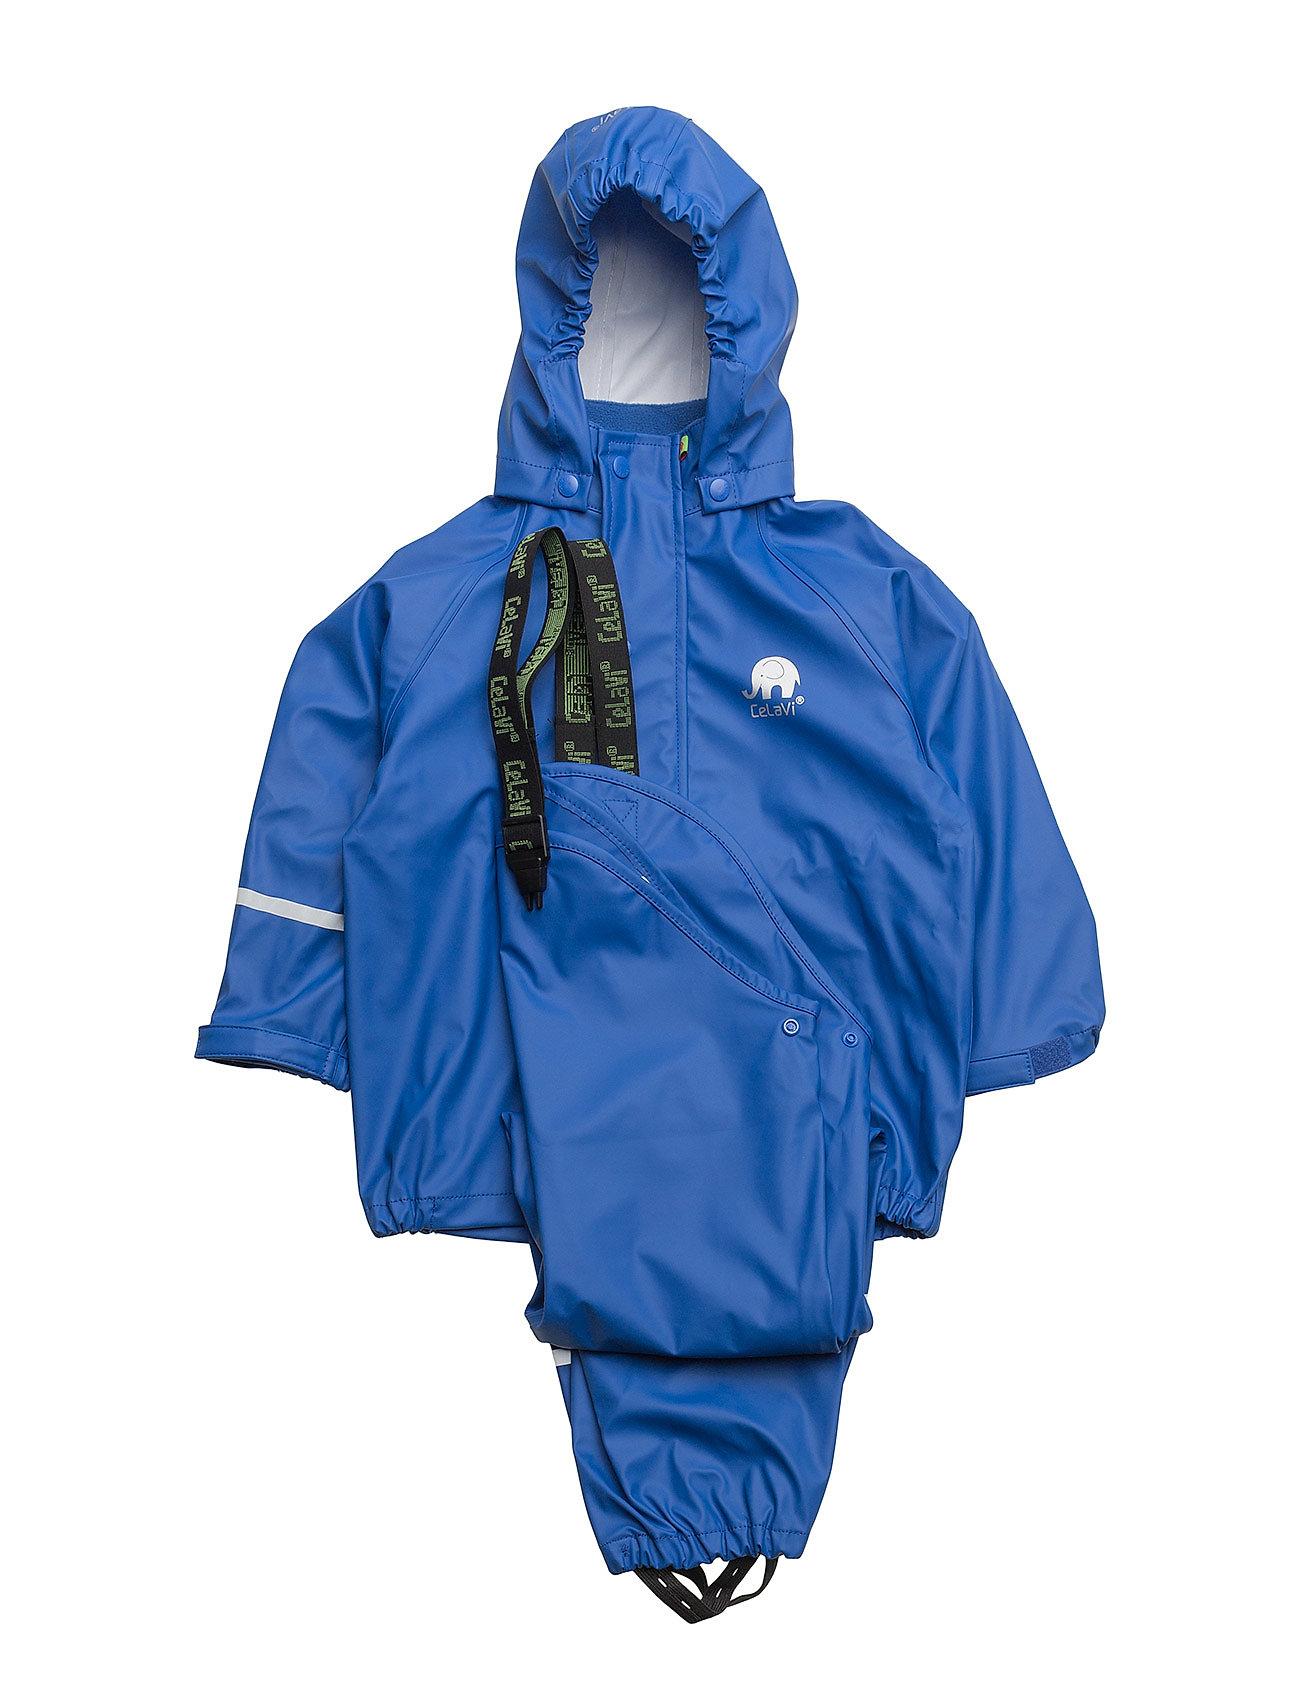 Image of Basci Rainwear Set, Solid Regntøj Blå CeLaVi (3409543535)